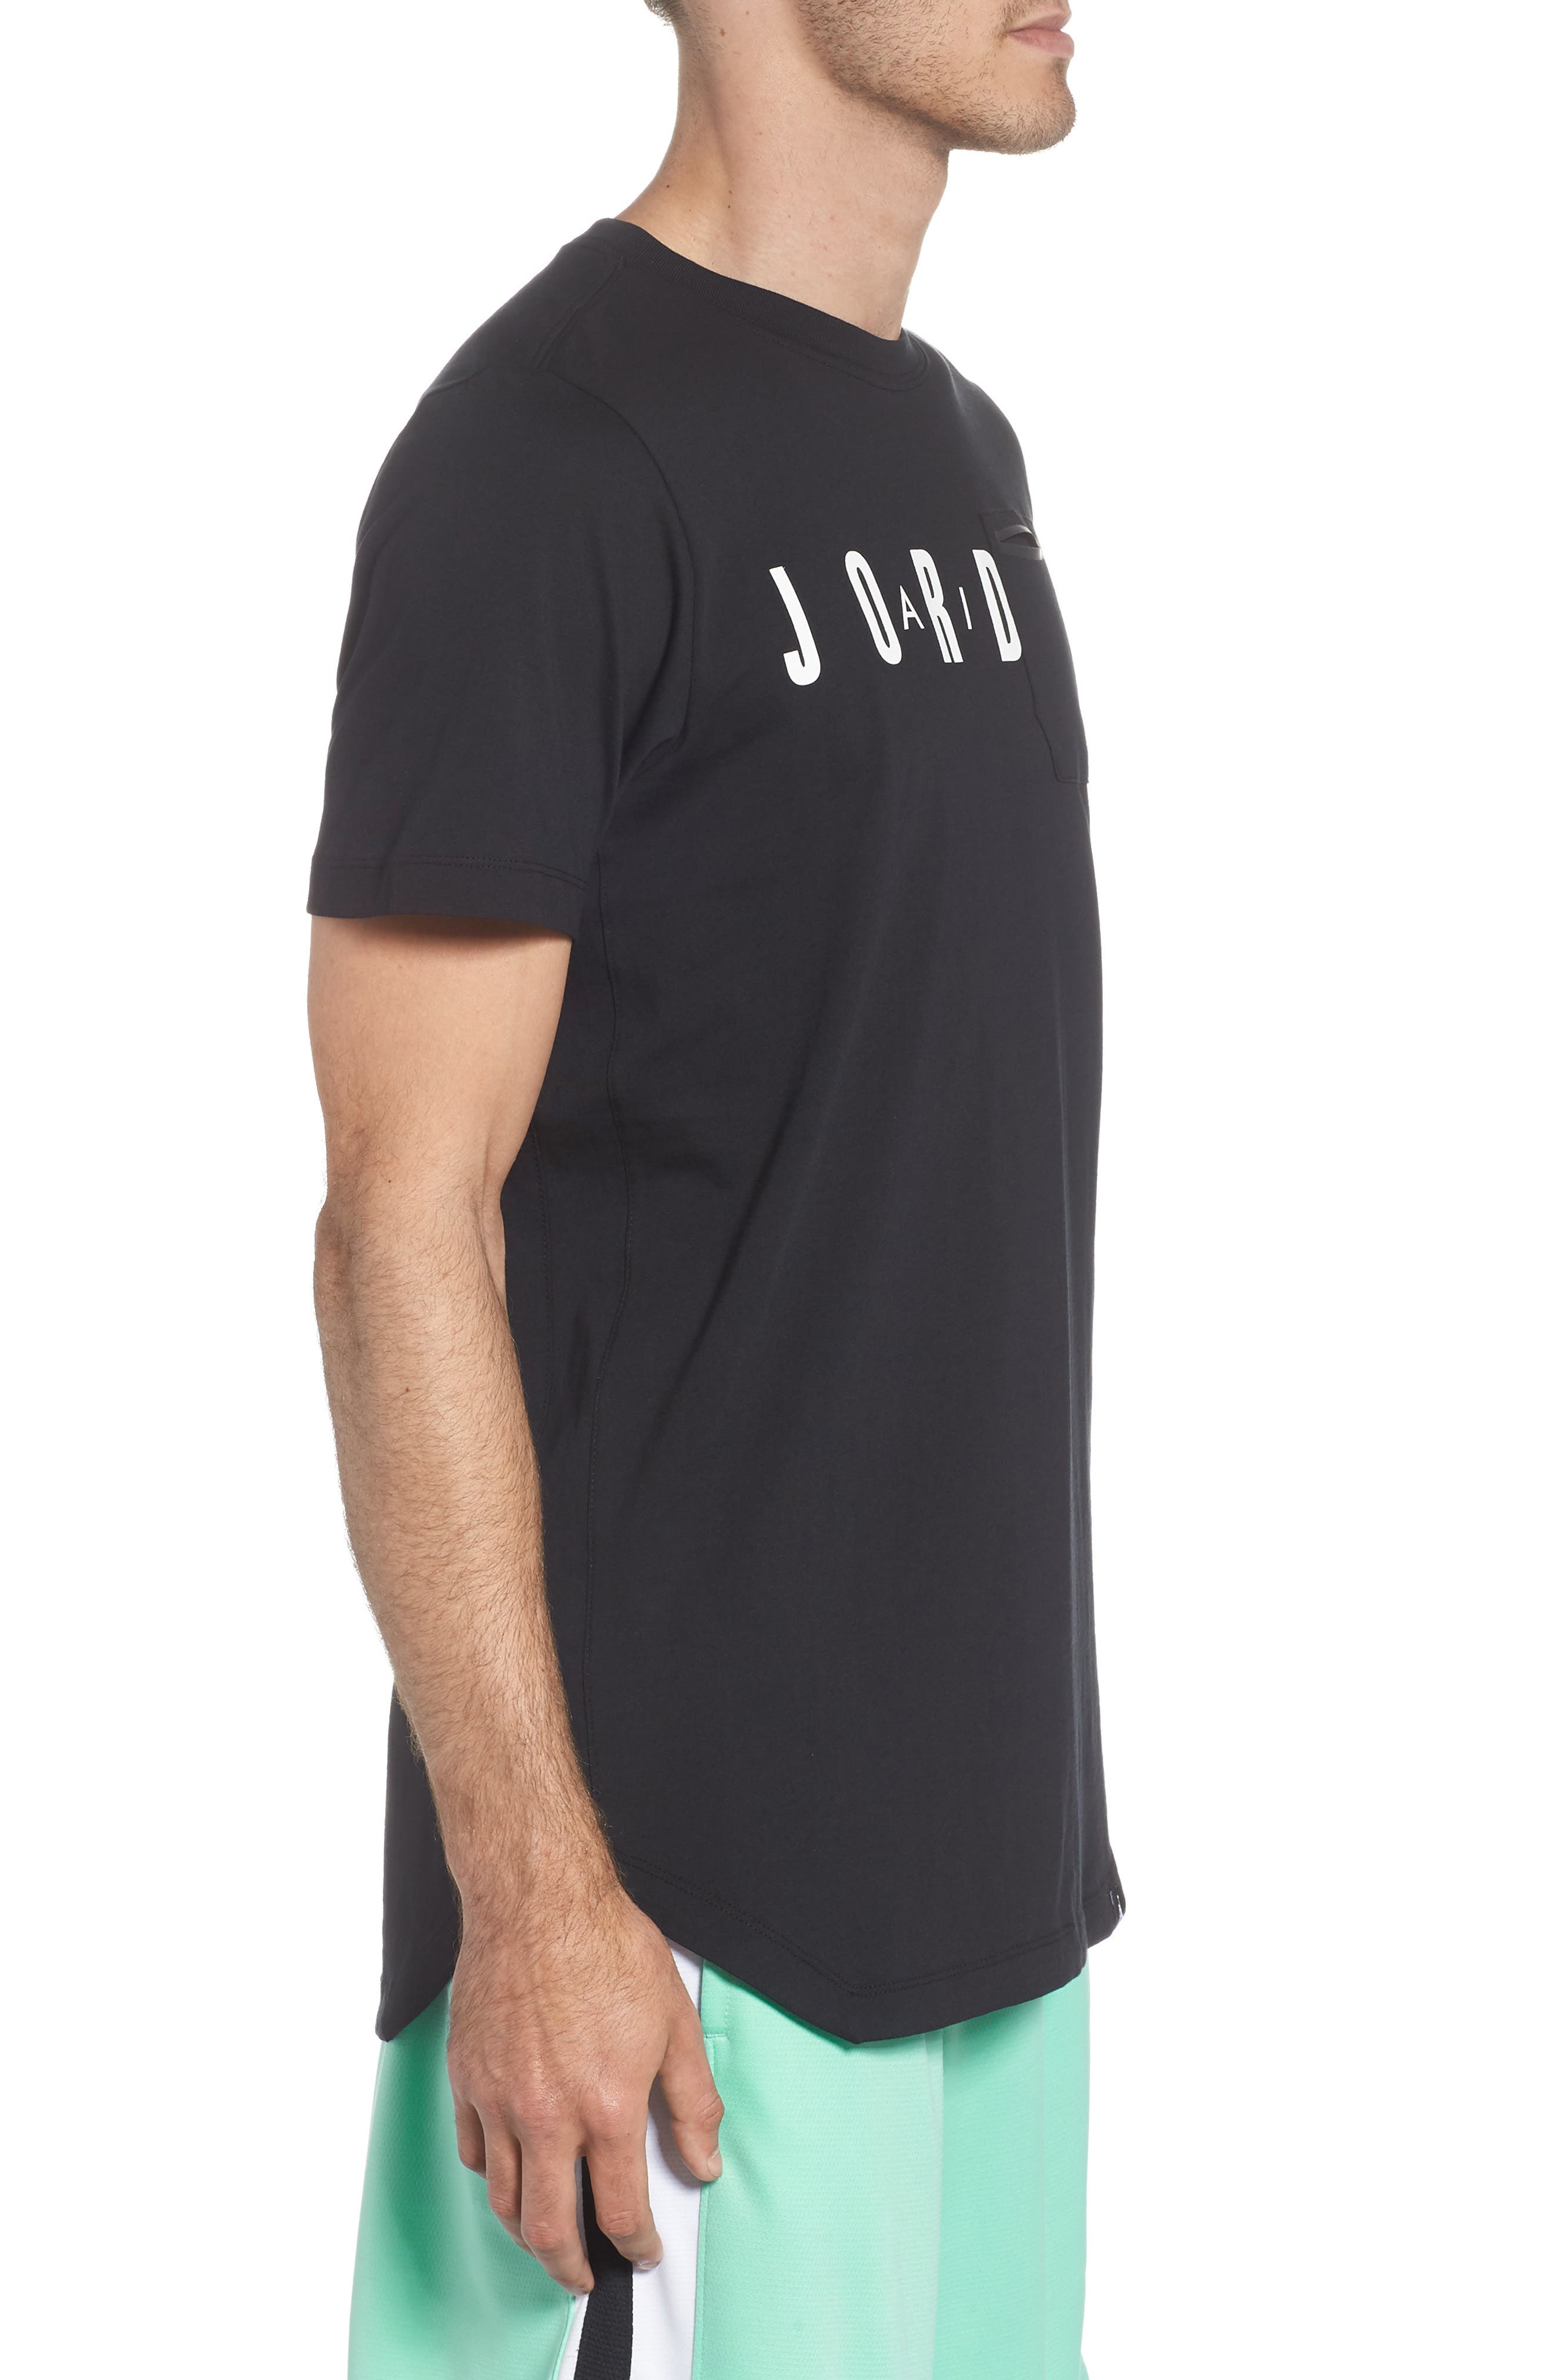 Jordan Sportswear Graphic Shirt,                             Alternate thumbnail 3, color,                             Black/ White